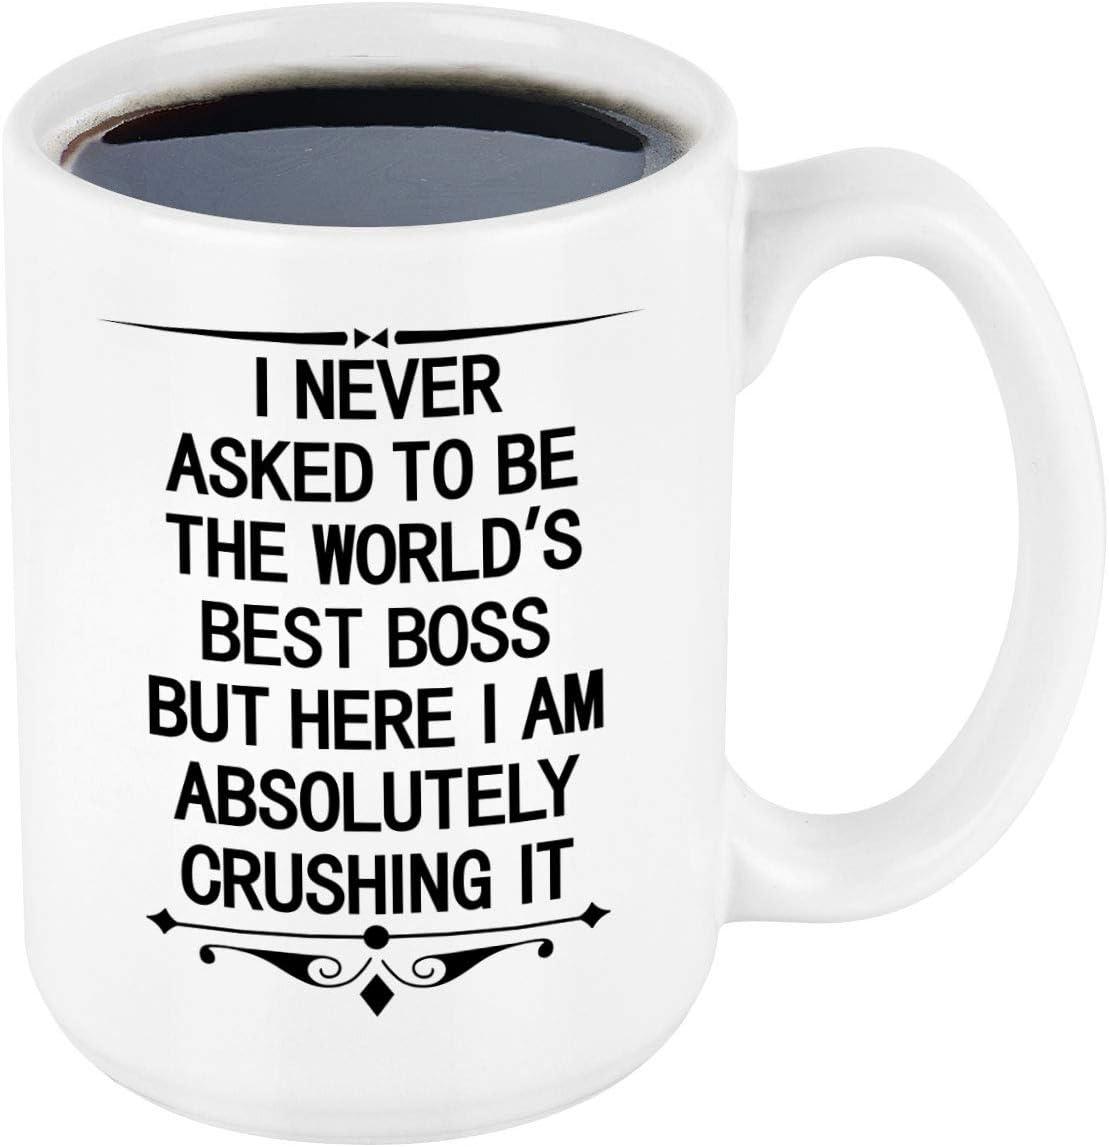 Worlds Best Boss Mug I NEVER ASKED TO BE THE WORLDS BEST BOSS BUT HERE Mug Boss Day Mug Boss Coffee Mugs Gifts Boss Gifts for Bosses Men Women Mug Office Coffee Mugs 16 oz Ceramic Coffee Mug